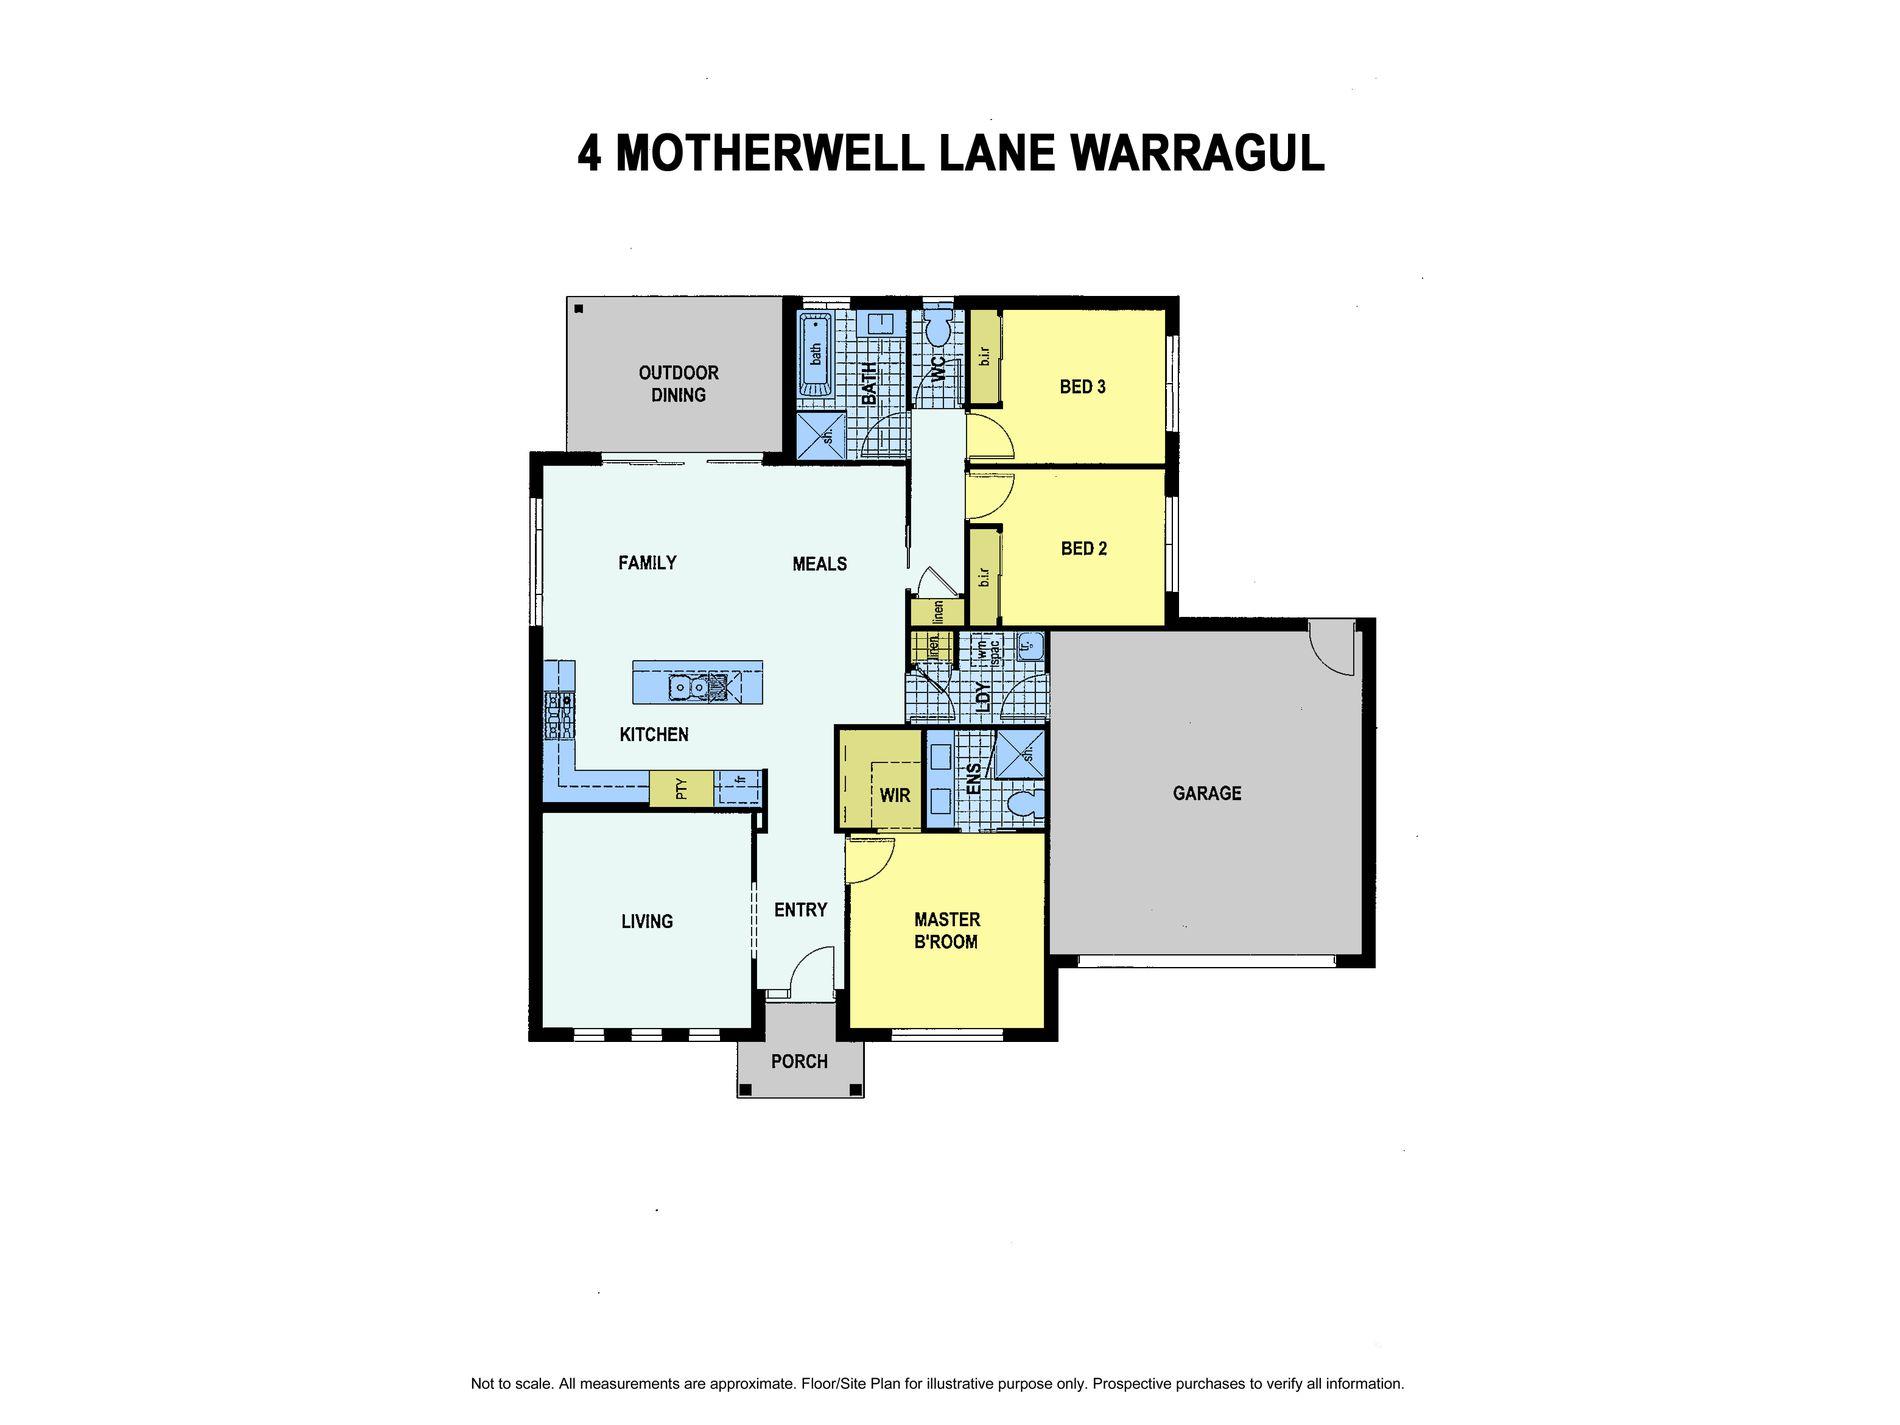 6 Motherwell Lane, Warragul